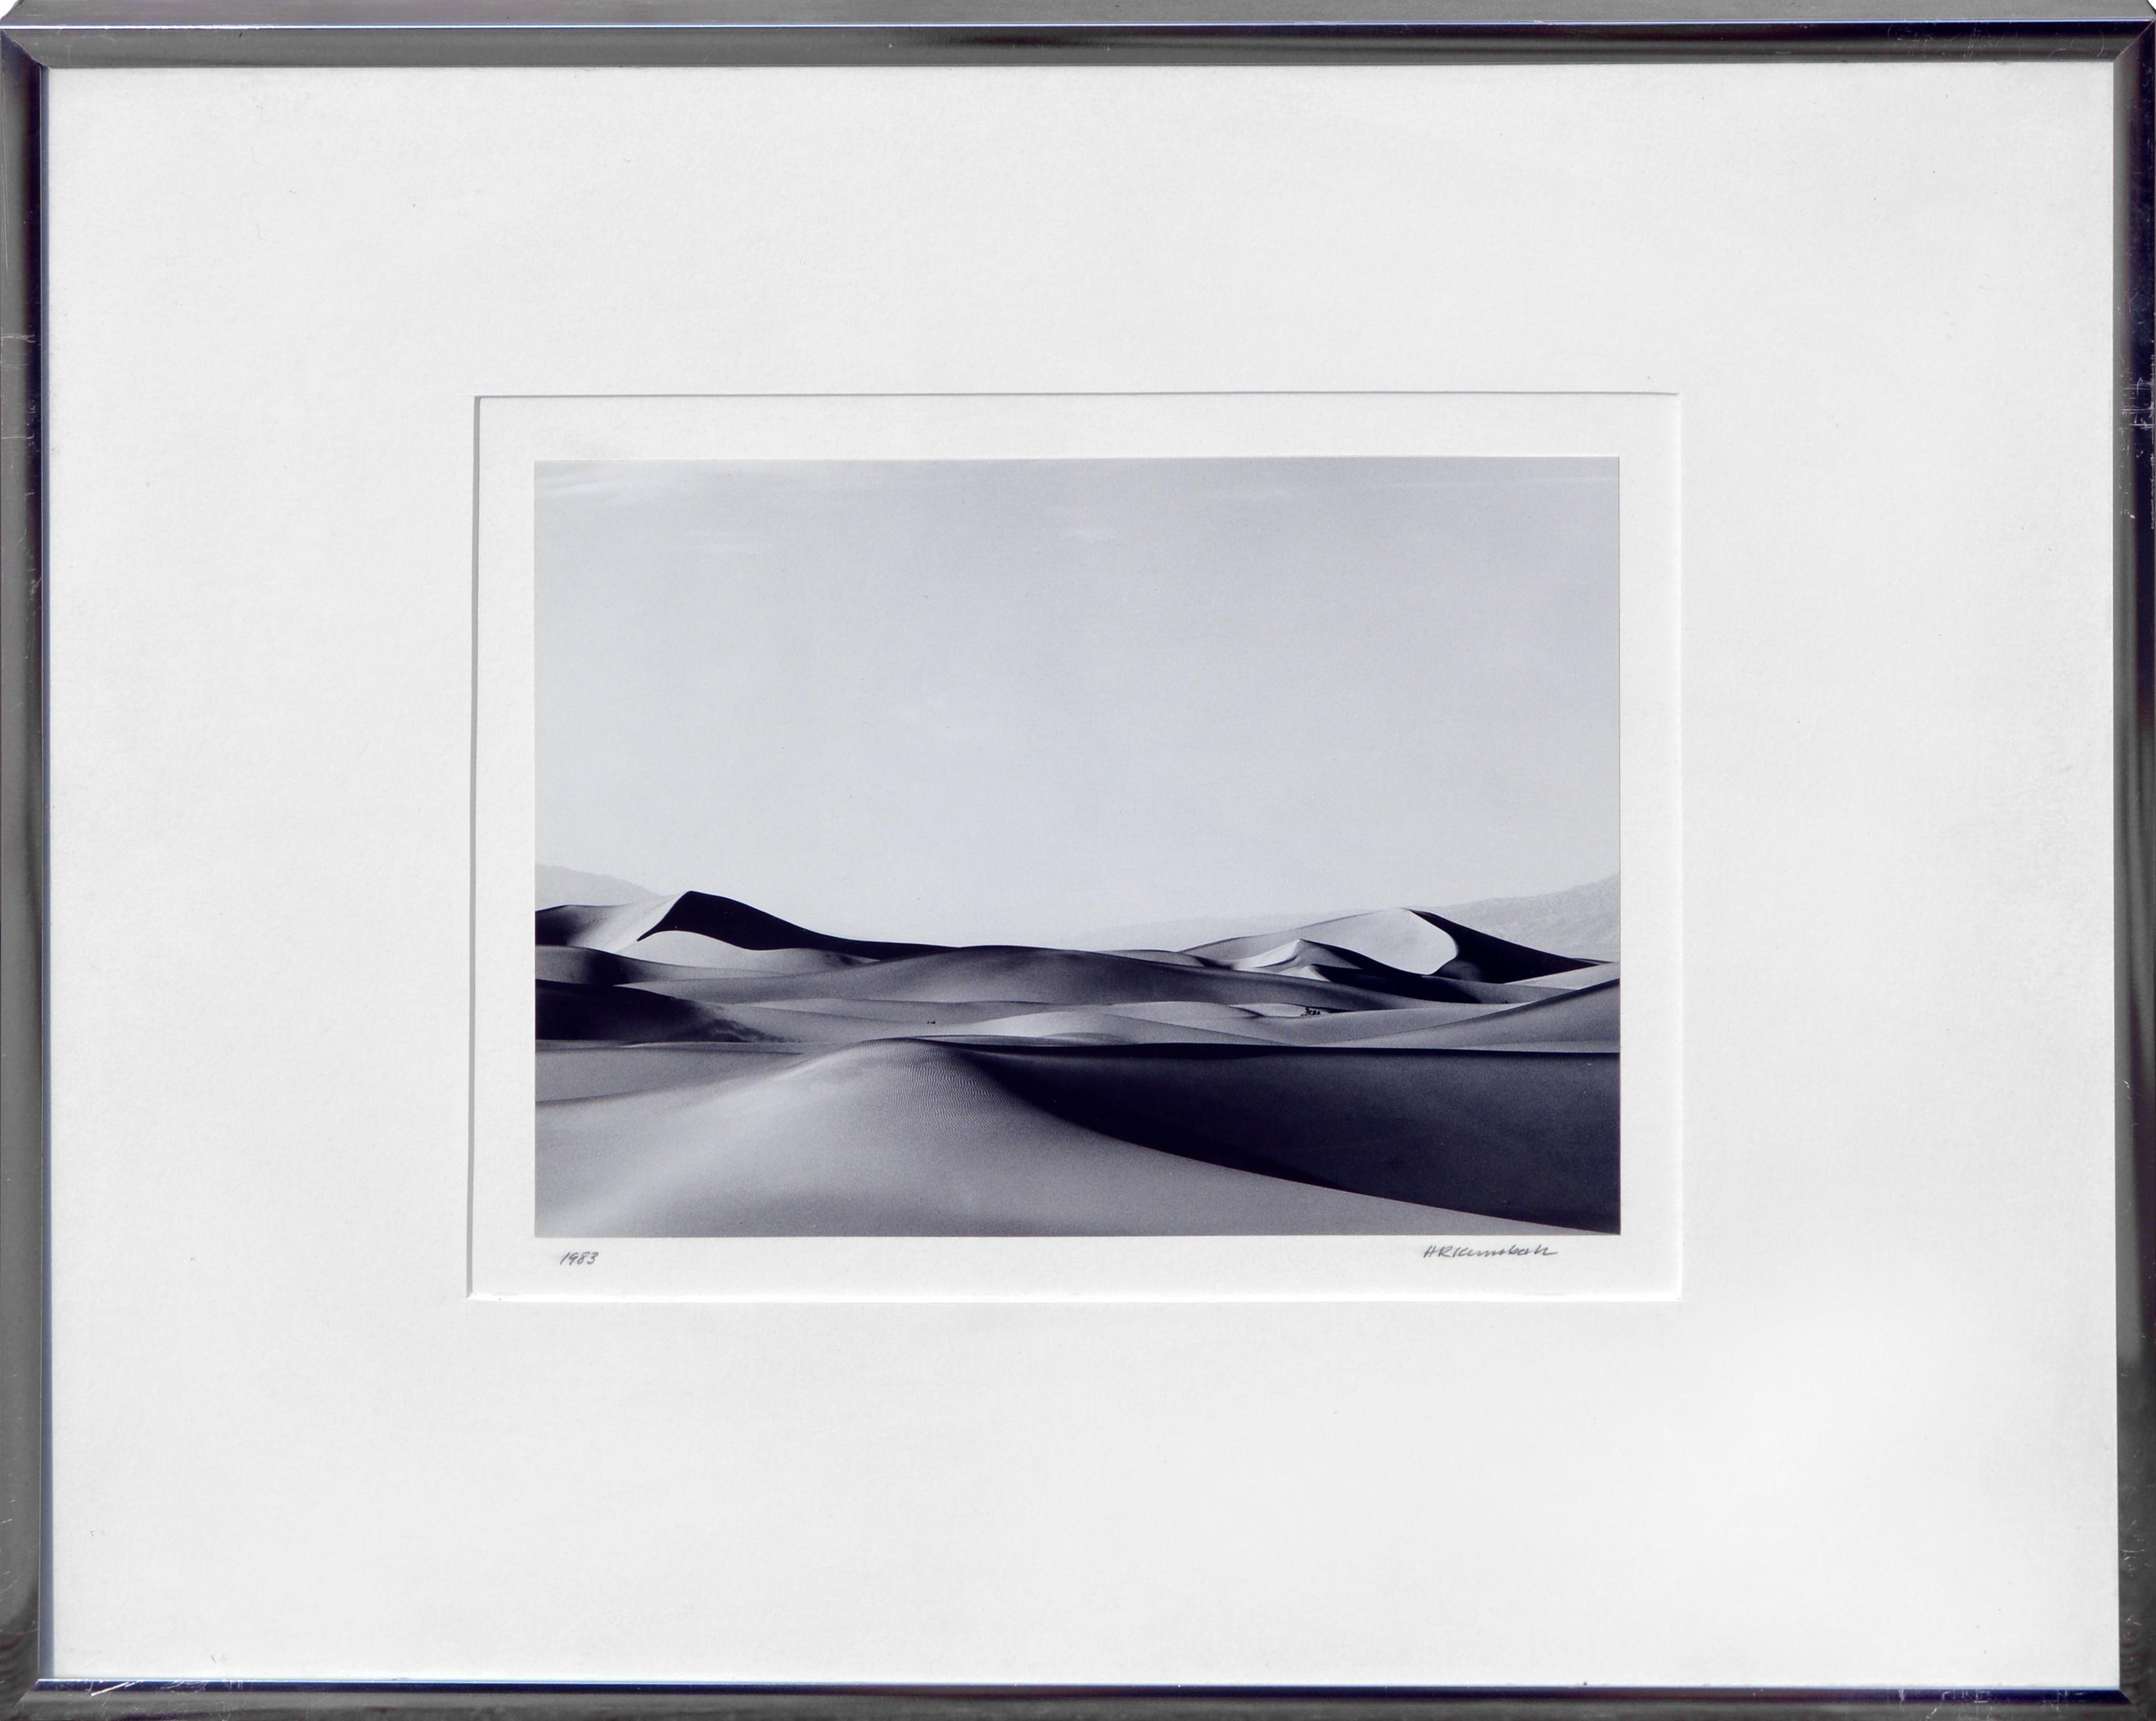 """Sand Dunes Death Valley"" - Minimal Desert Black & White Landscape Photograph"